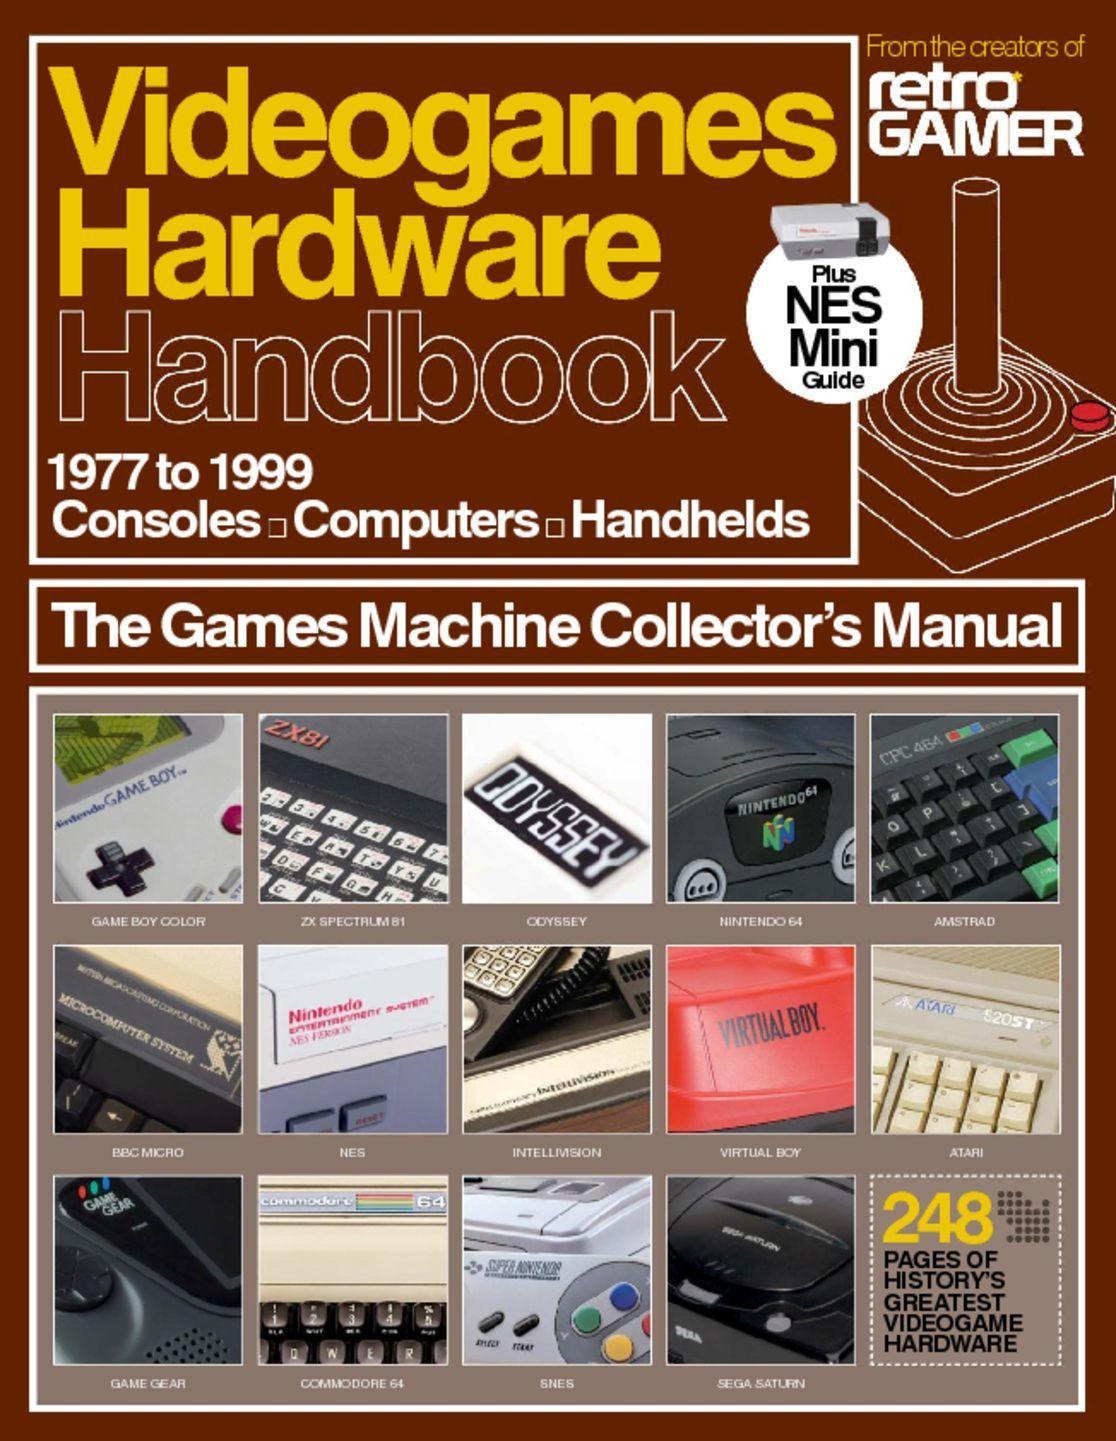 Videogames Hardware Handbook Digital